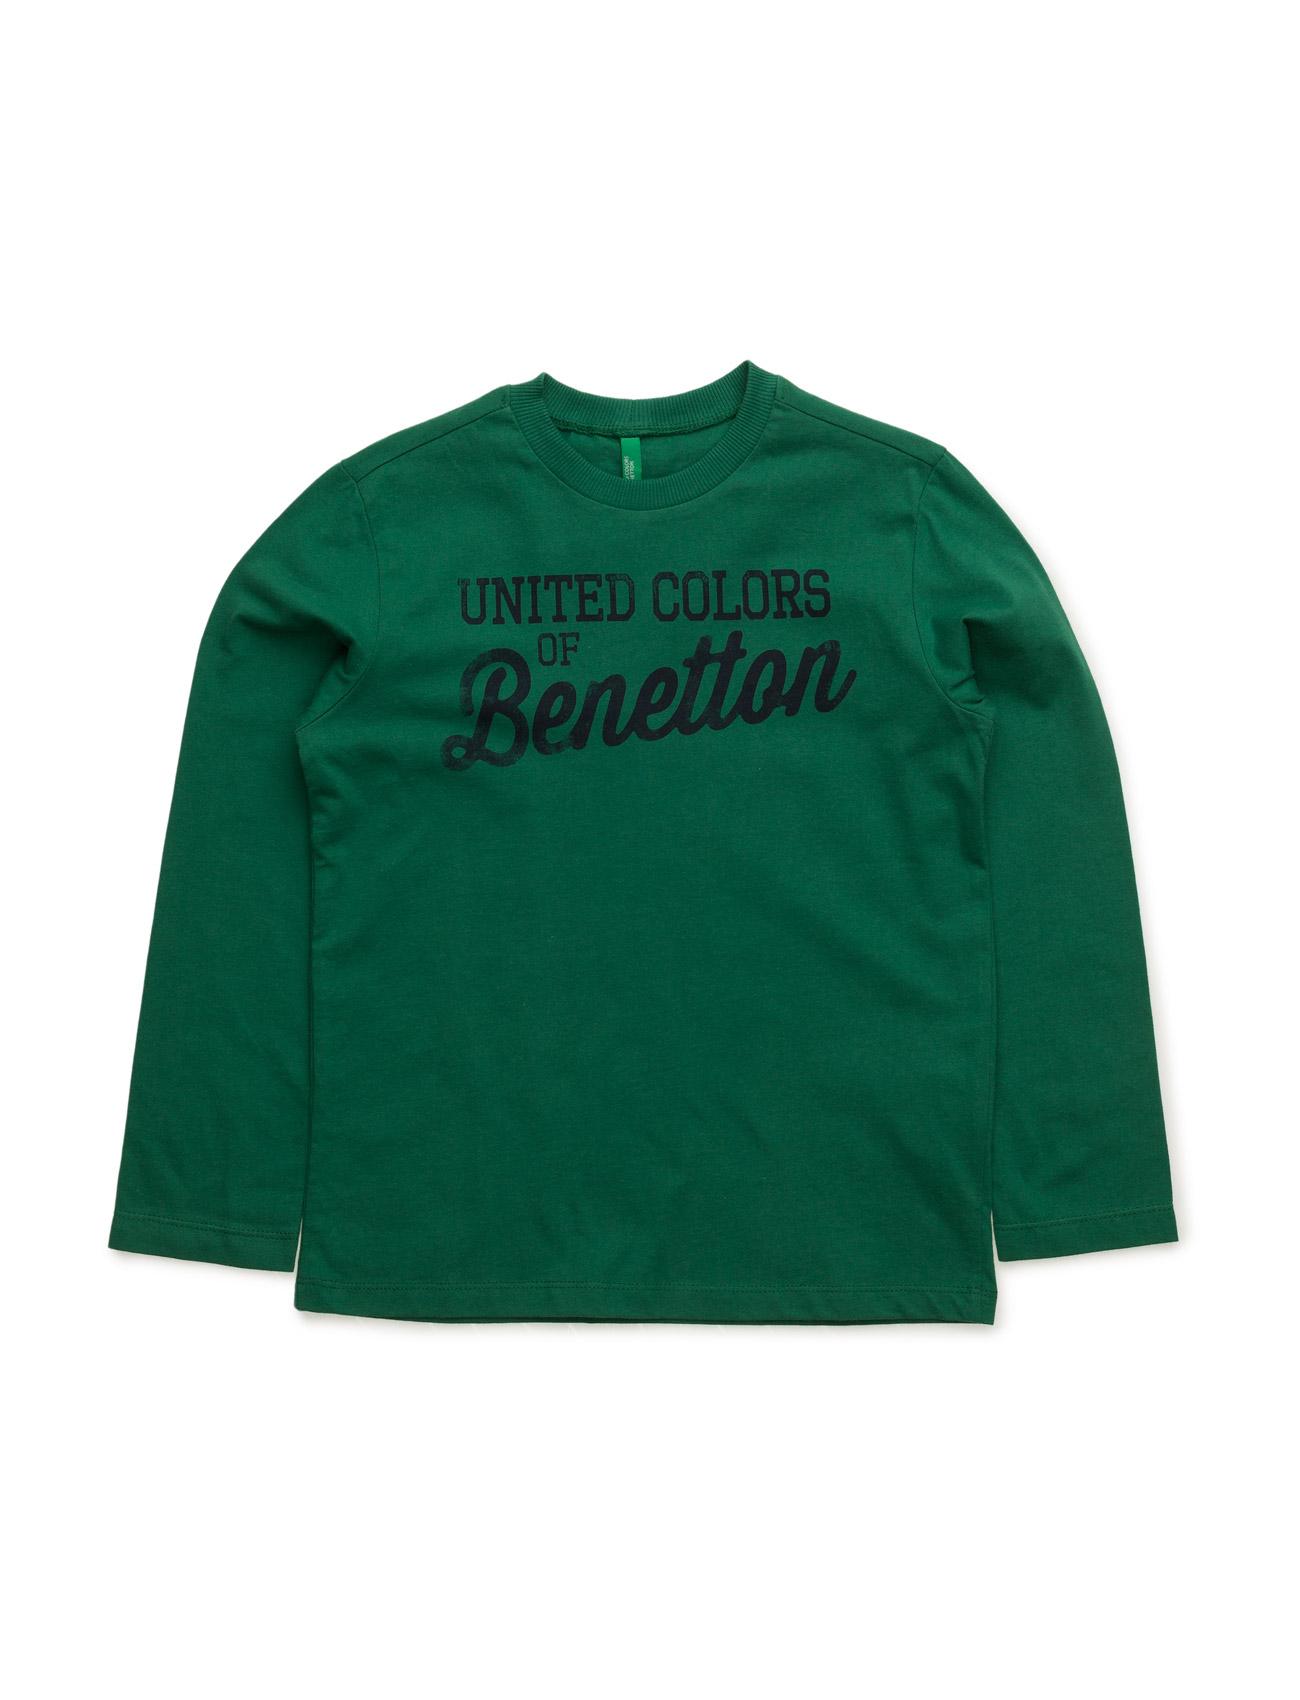 T-Shirt L/S United Colors of Benetton T-shirts til Drenge i Grøn